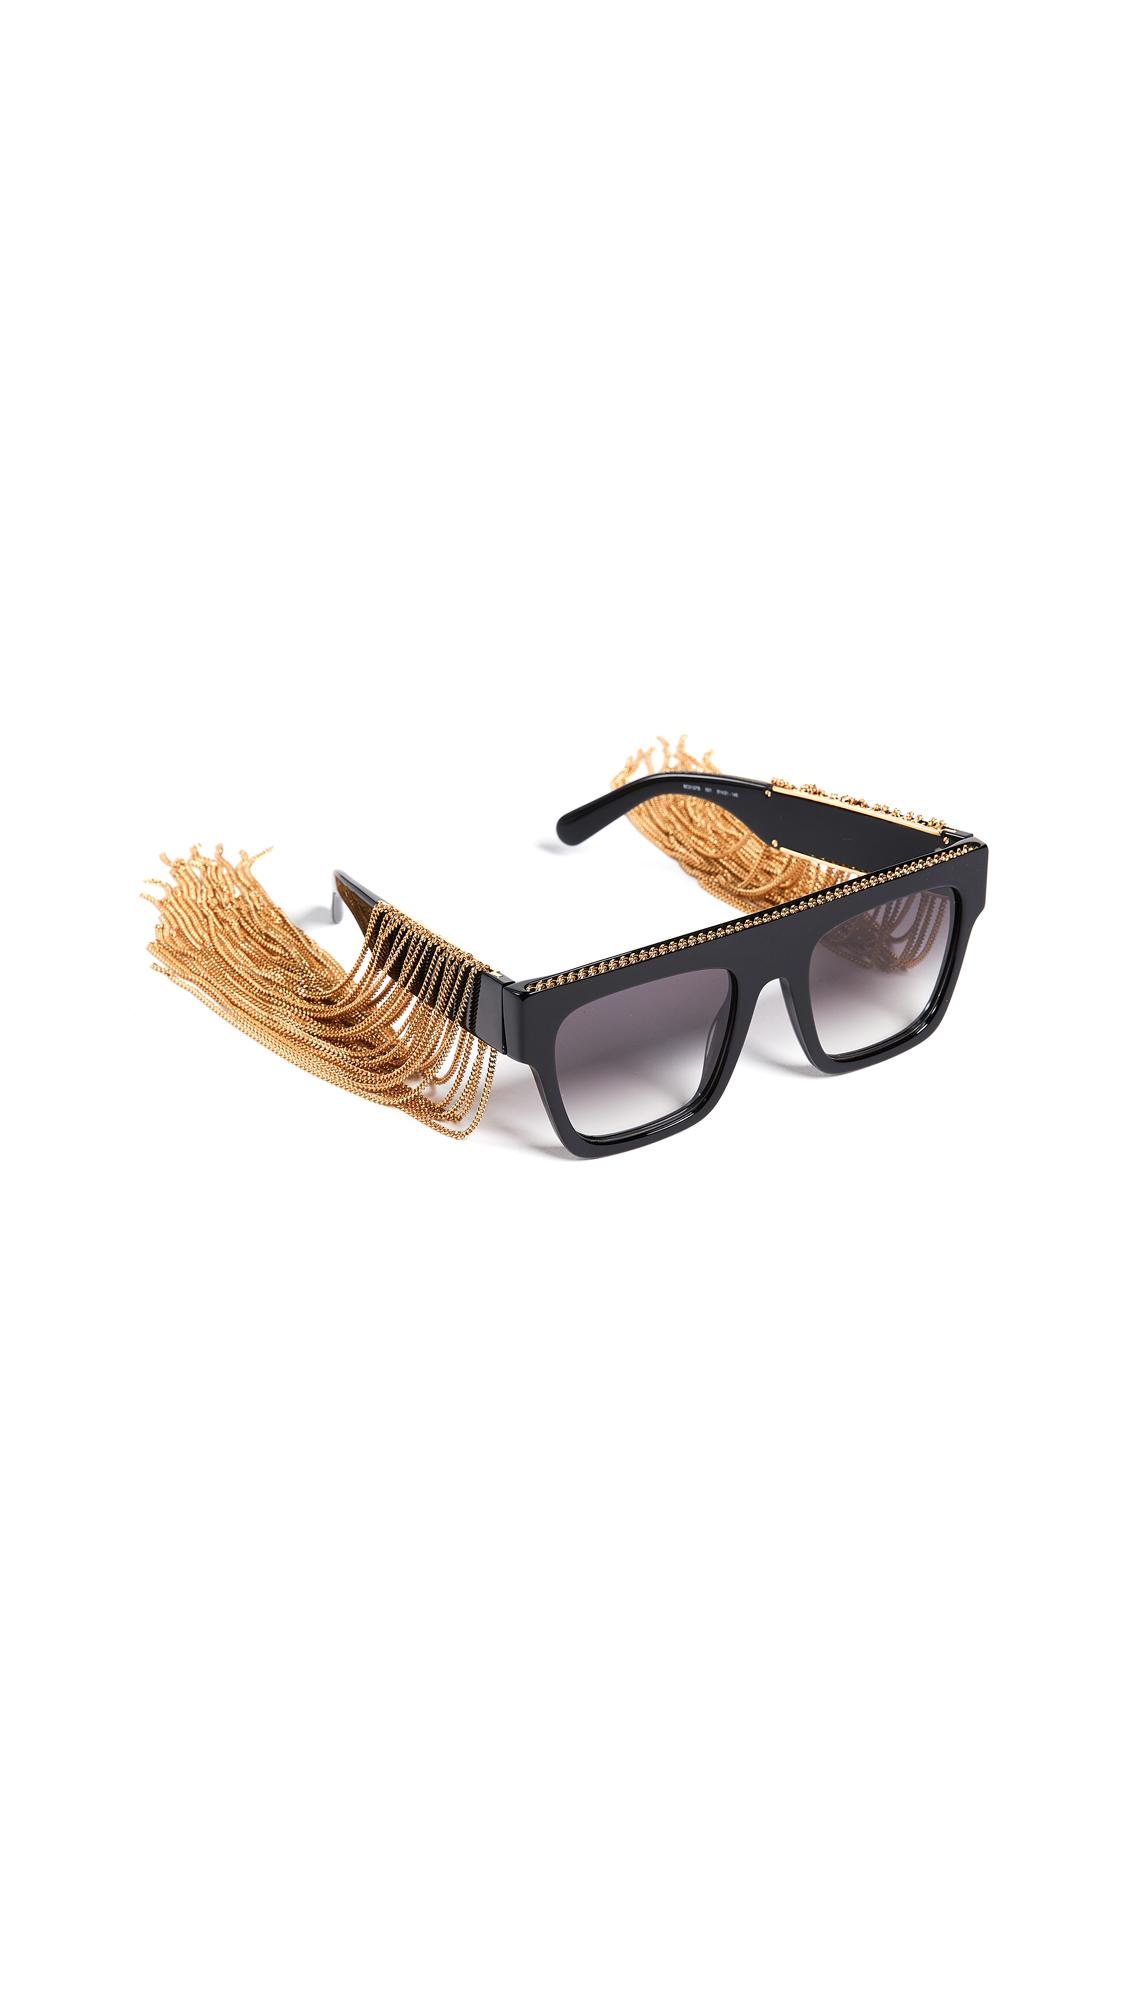 2257837aba9e Stella McCartney Rectangular Sunglasses with Hanging Chain Detail ...